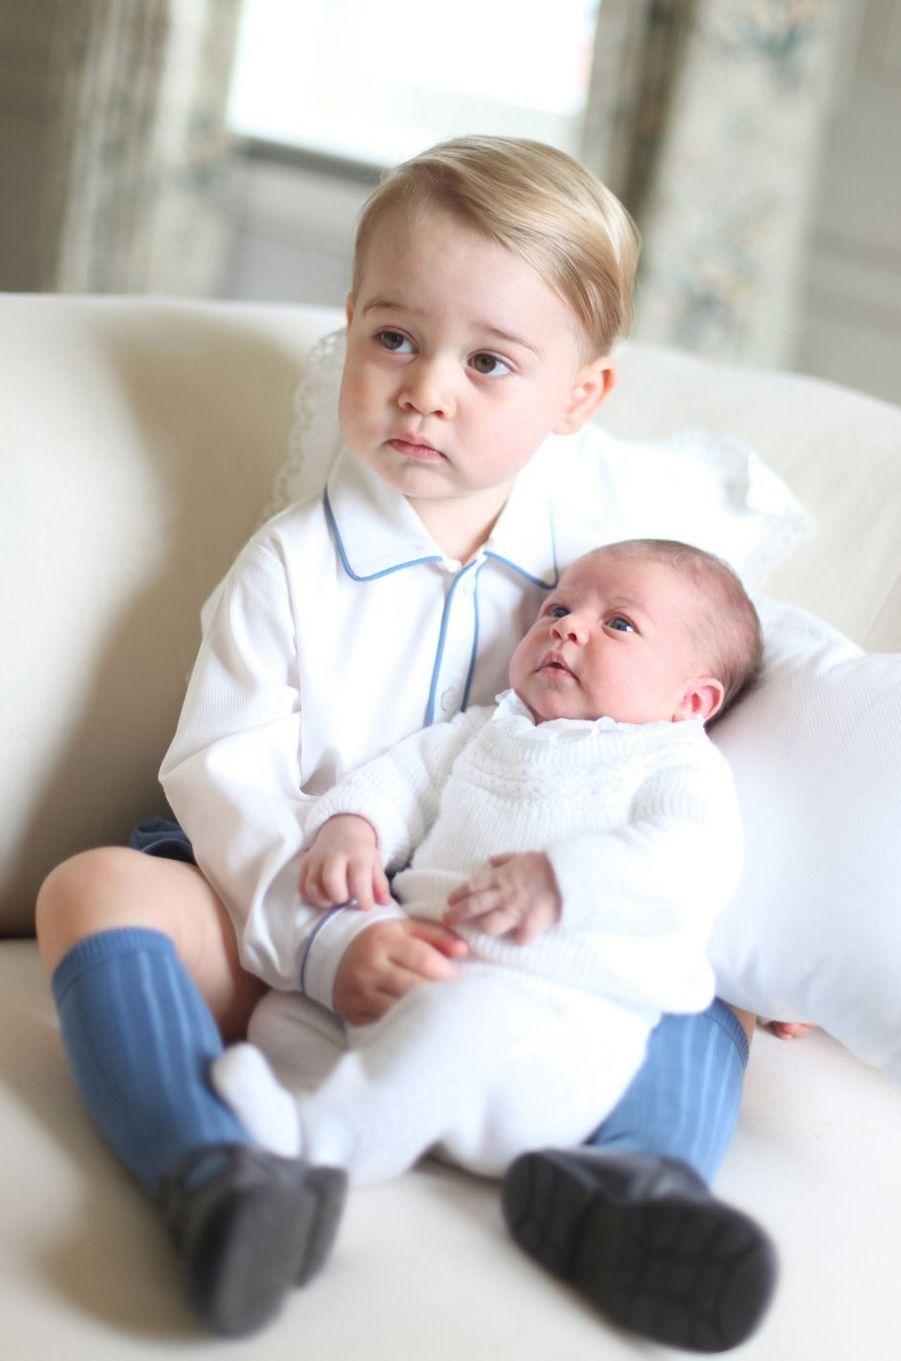 Le prince George, avec sa petite soeur la princesse Charlotte, le 6 juin 2015